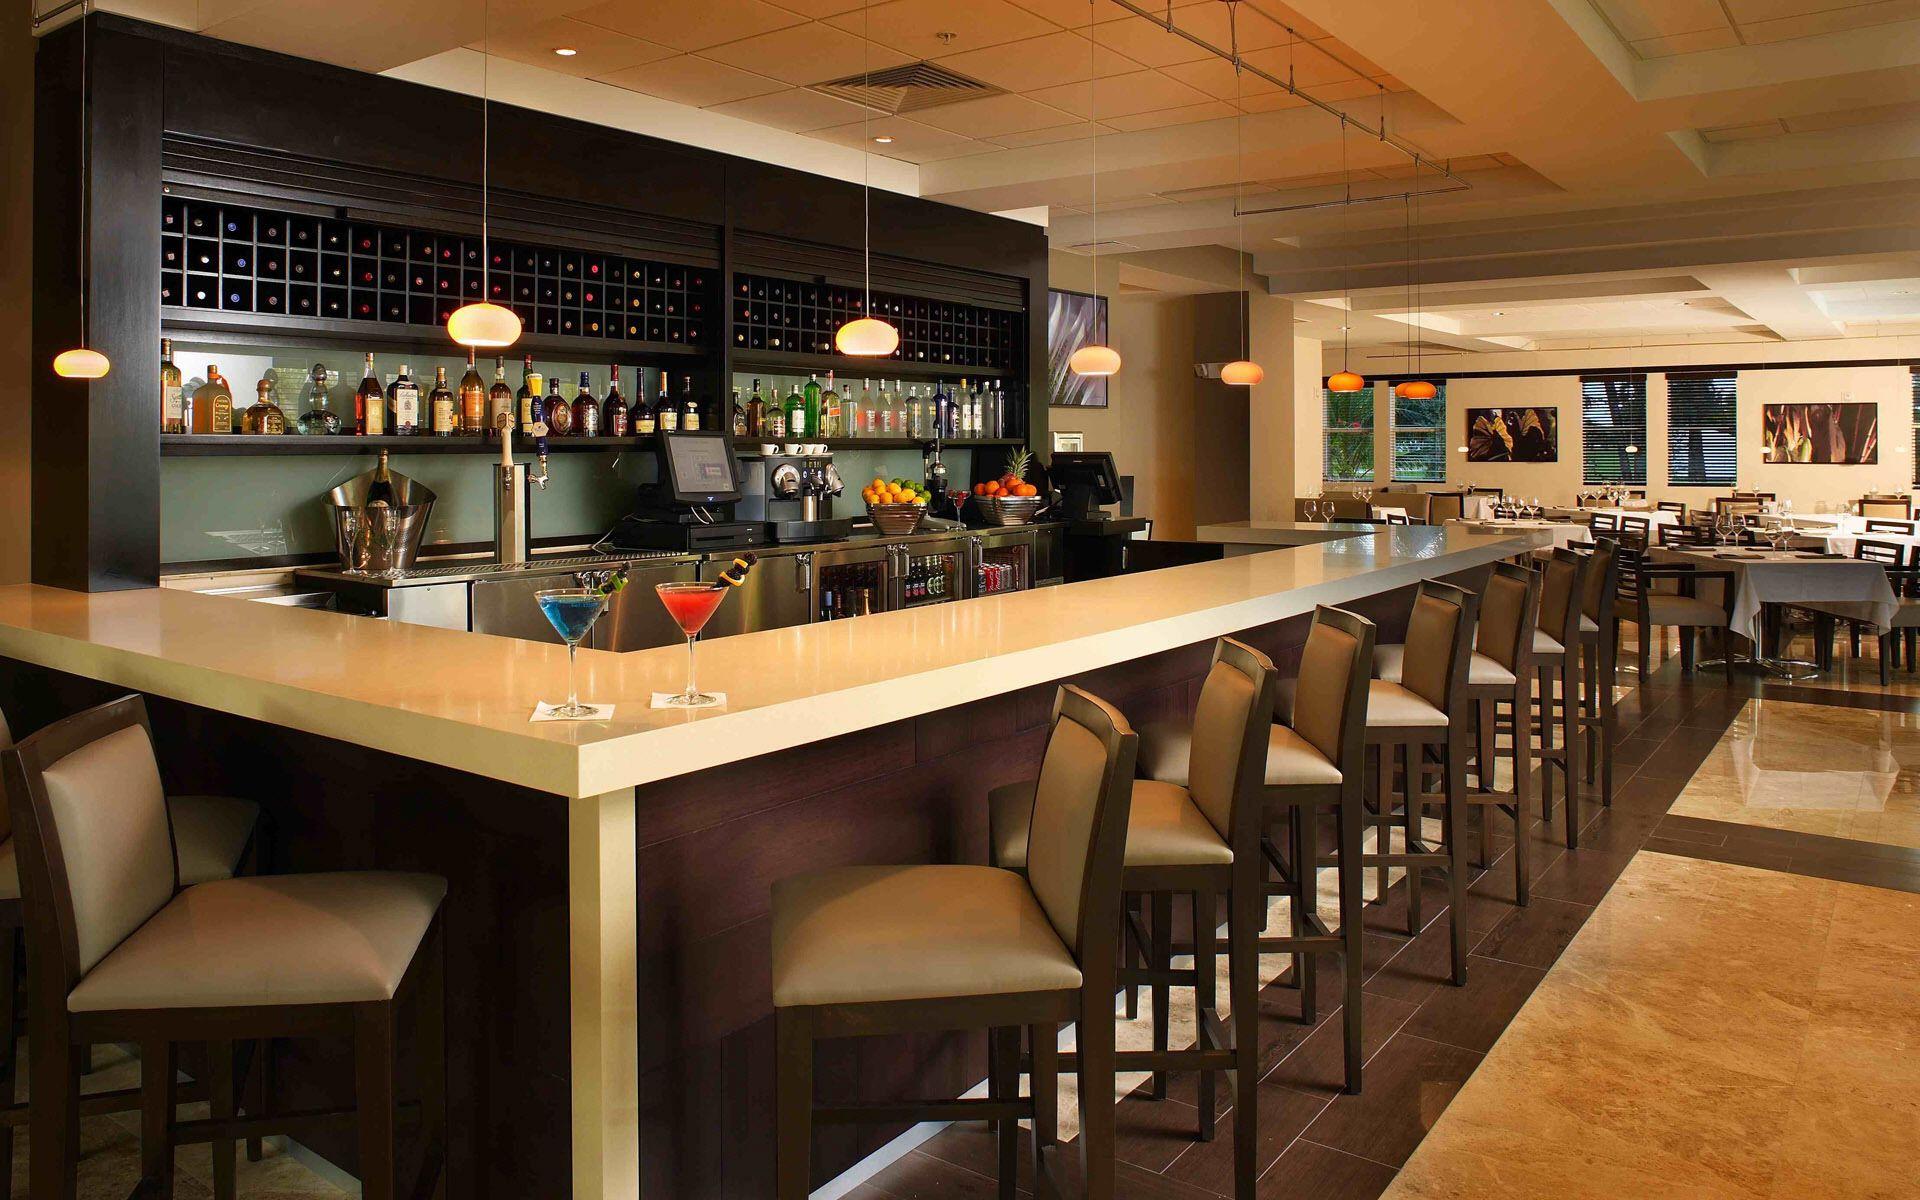 Best Cafe Design Ideas Restaurant Bar Design Ideas Jpg 1920 1200